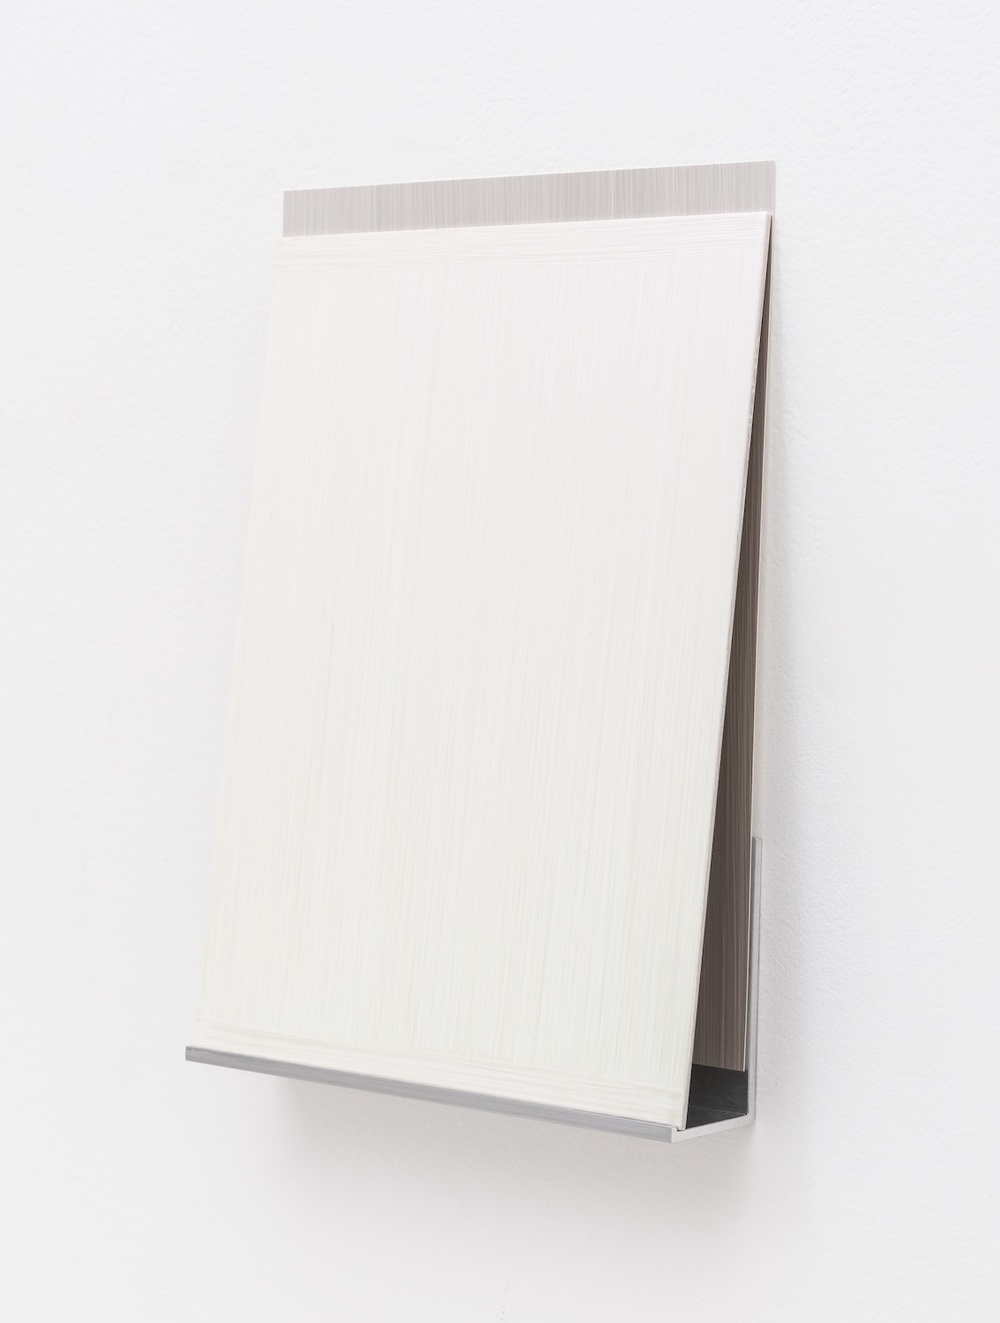 Imi Knoebel  An Meine Grüne Seite C 13-1  2012 Acrylic on aluminum, acrylic on plastic film, aluminum shelf 7 ⅚h x 7 ¹⁄₁₂w x 1 ½d in IK006